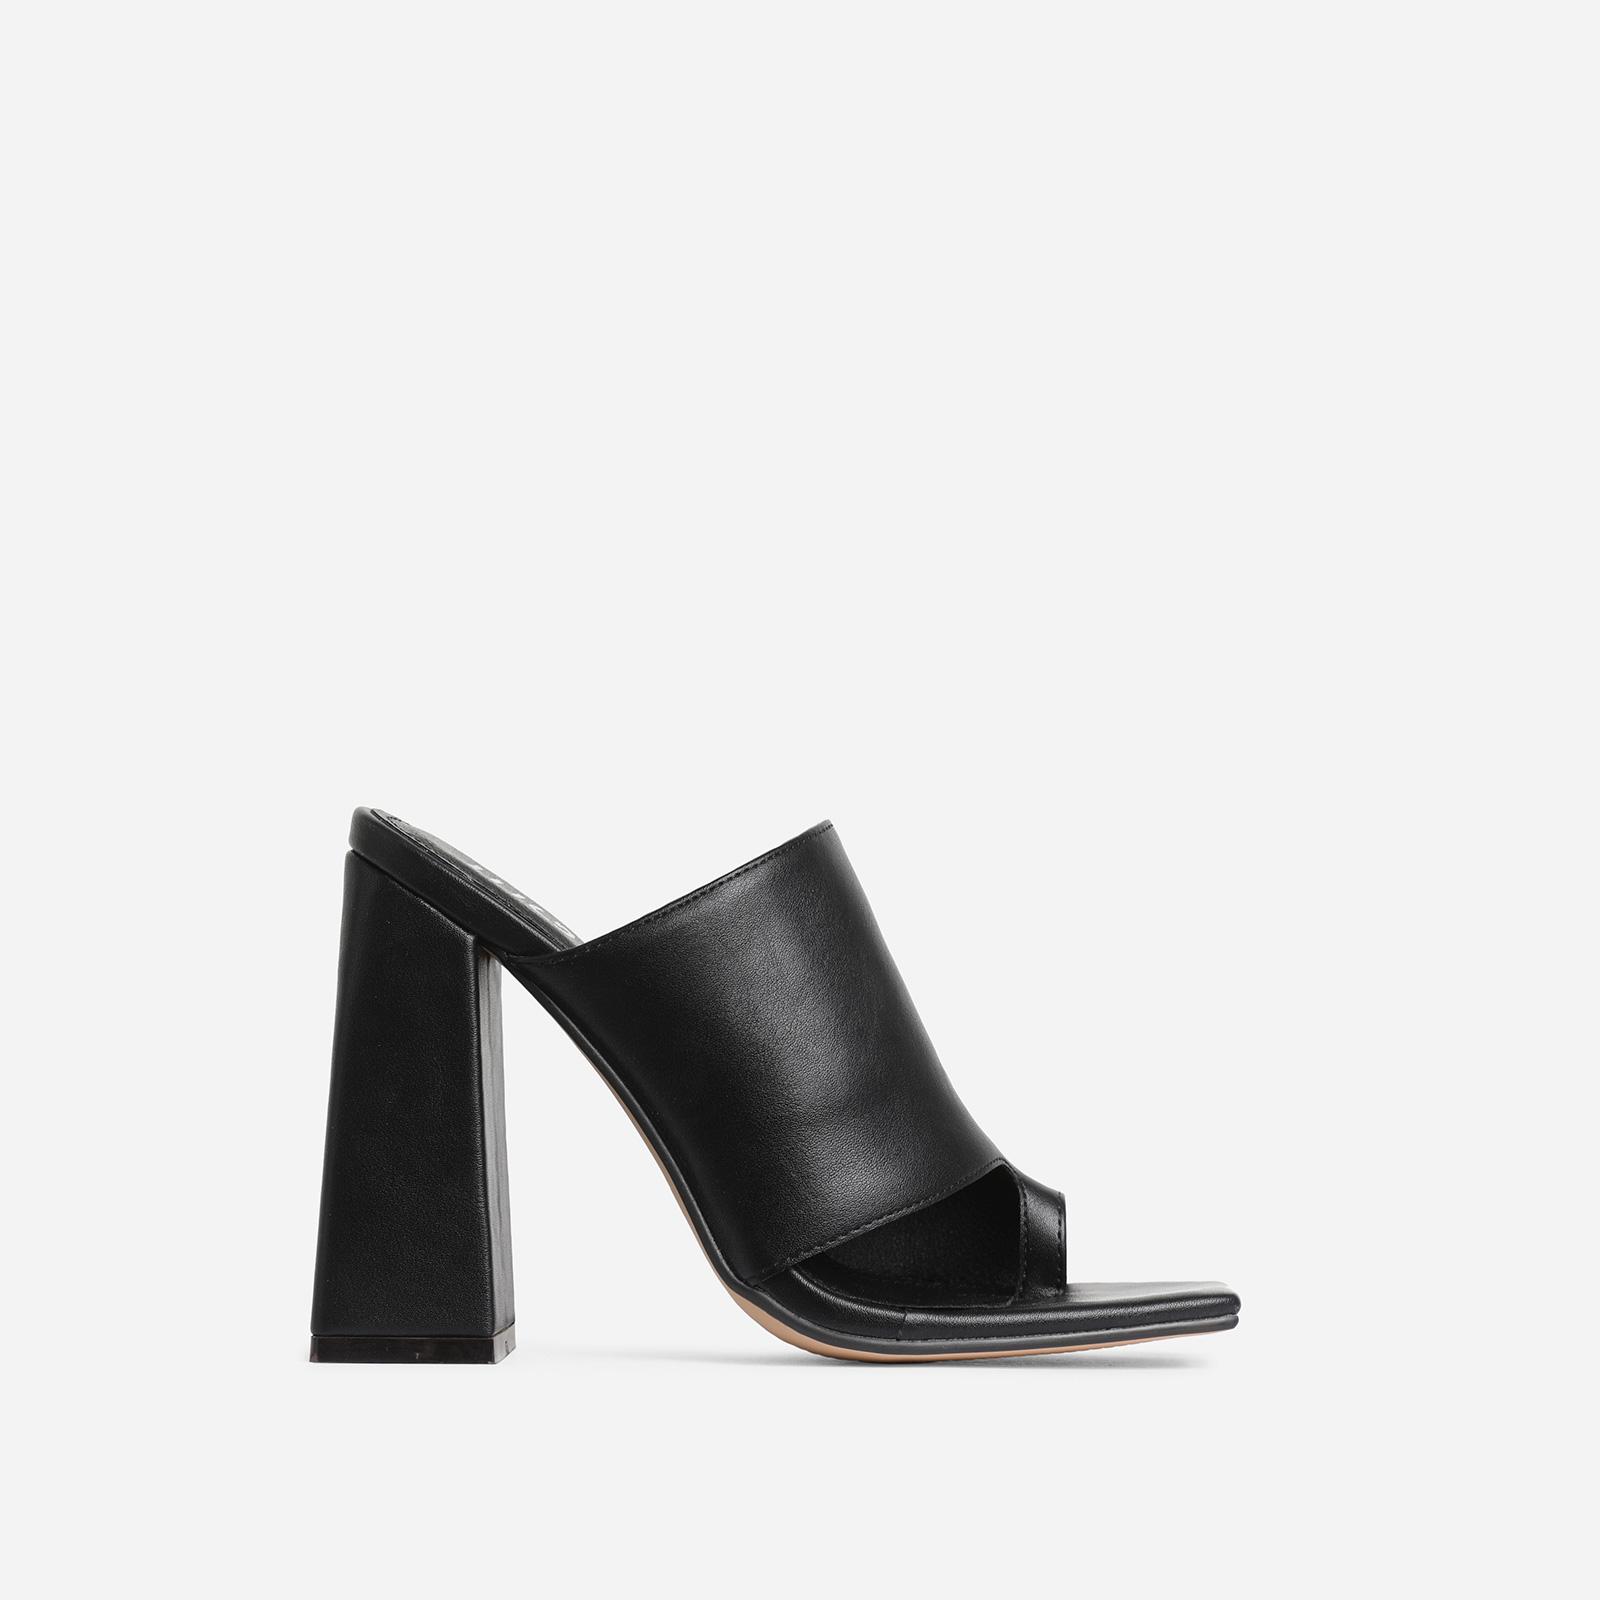 Anfo Square Peep Toe Flared Block Heel Mule In Black Faux Leather